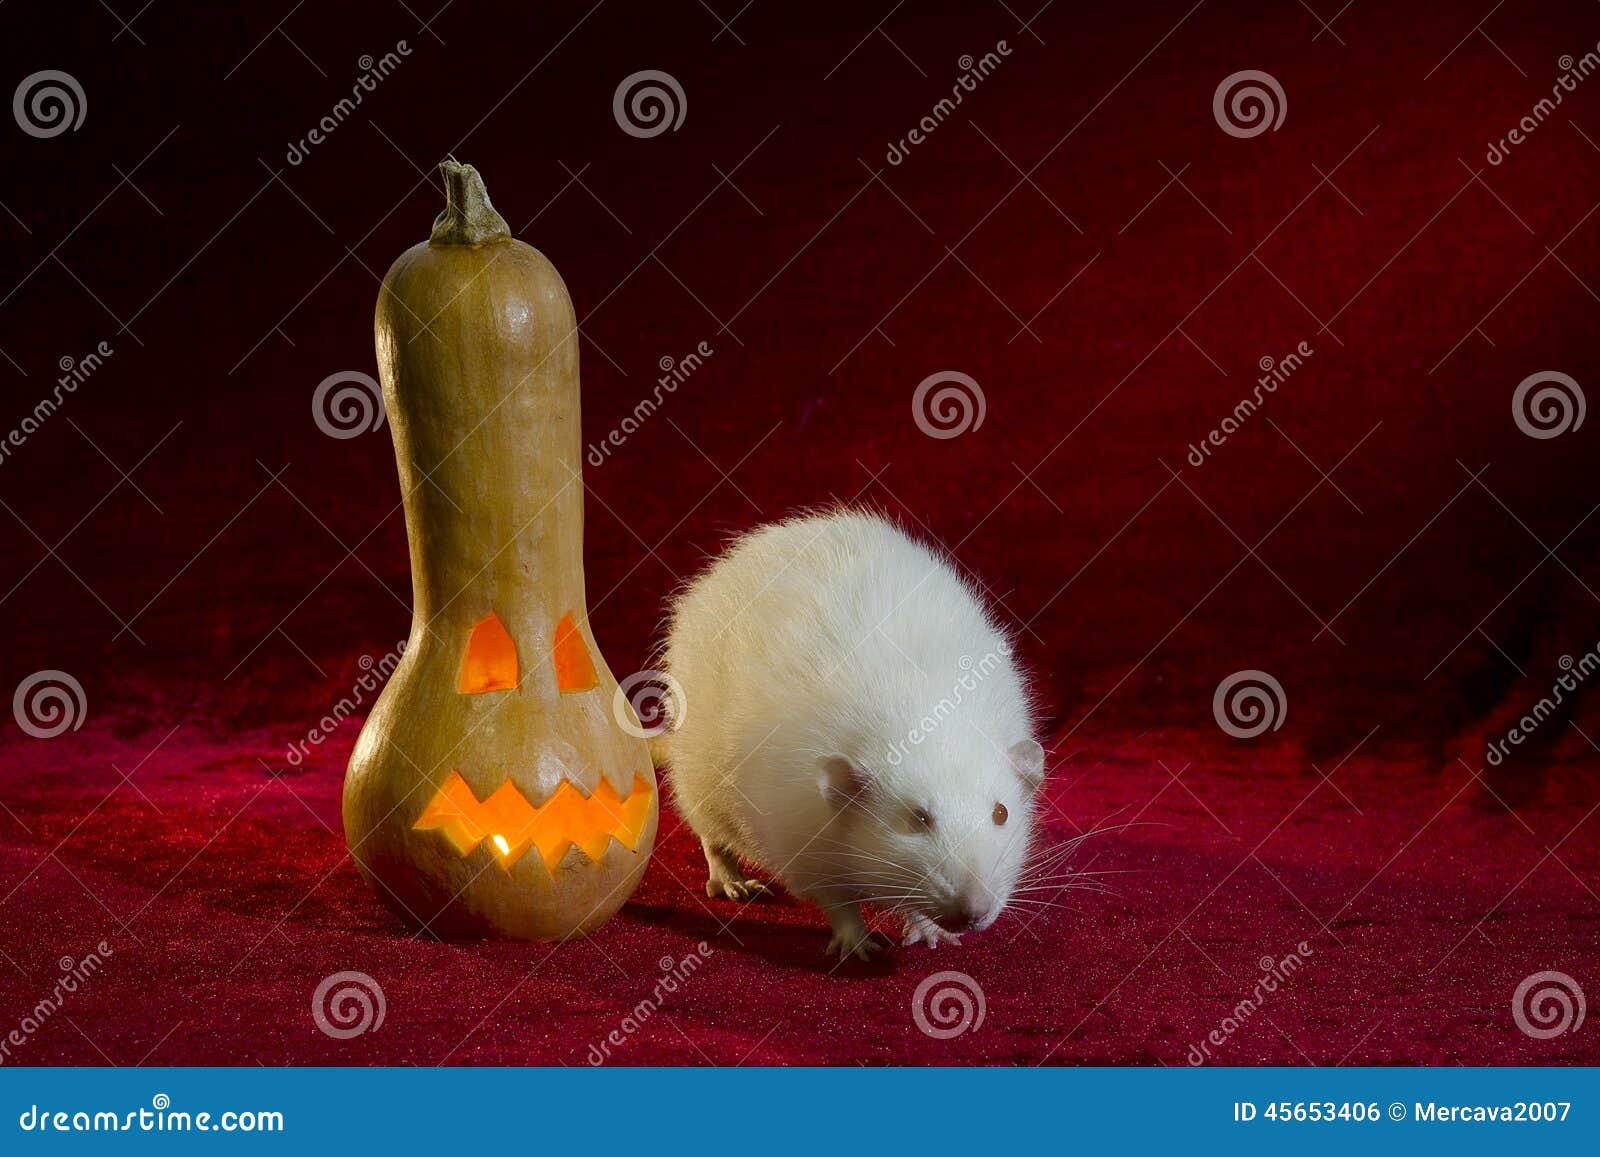 Jack-o -lantern and rat.